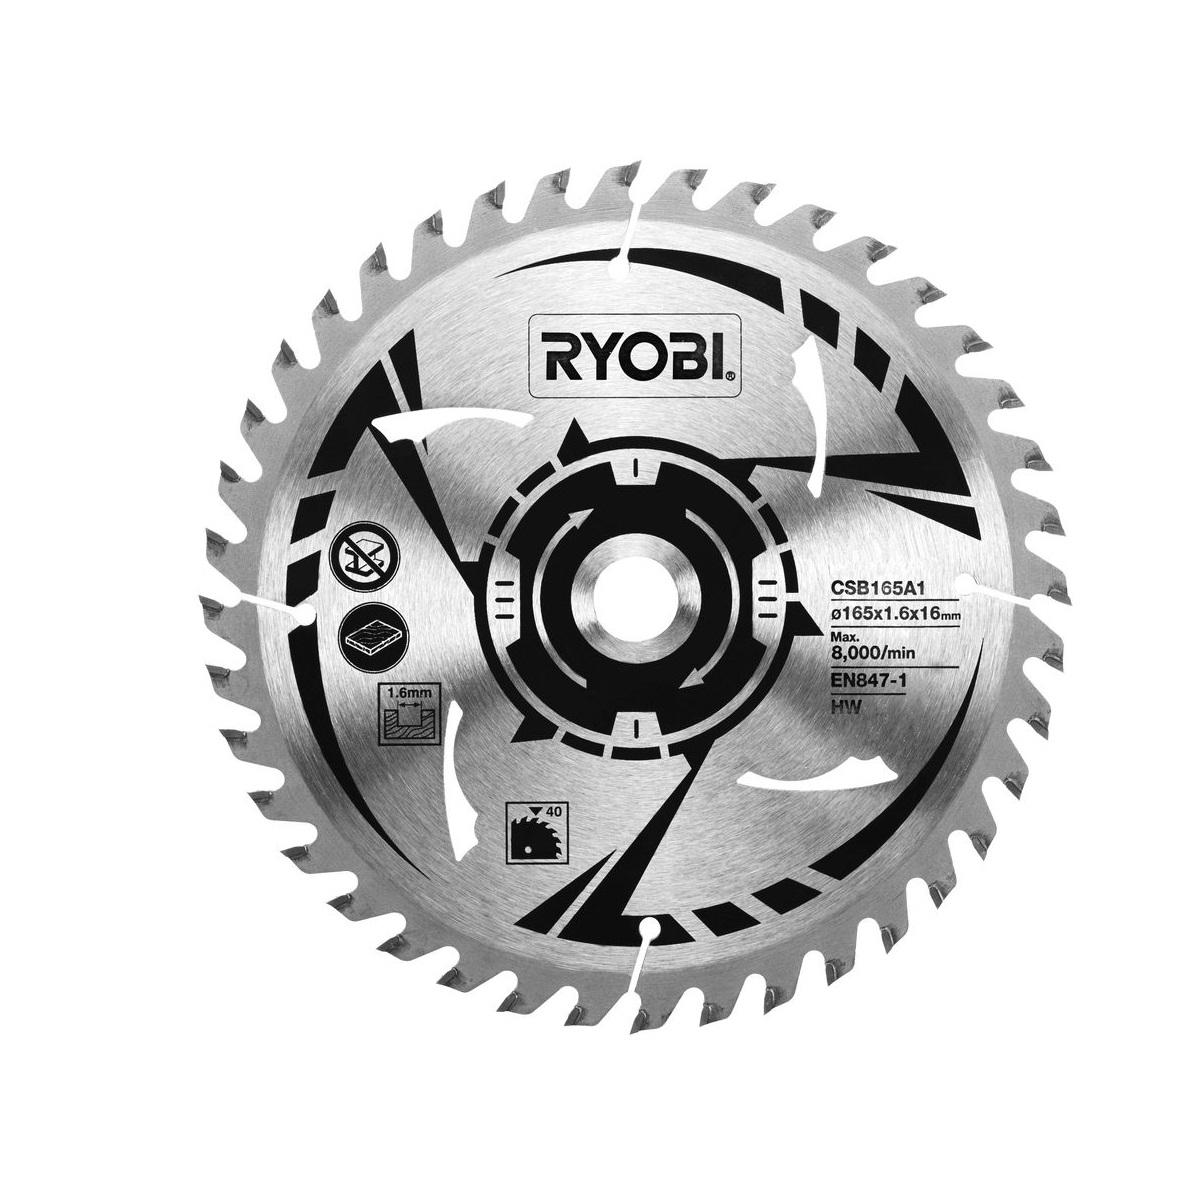 Ryobi CSB165A1